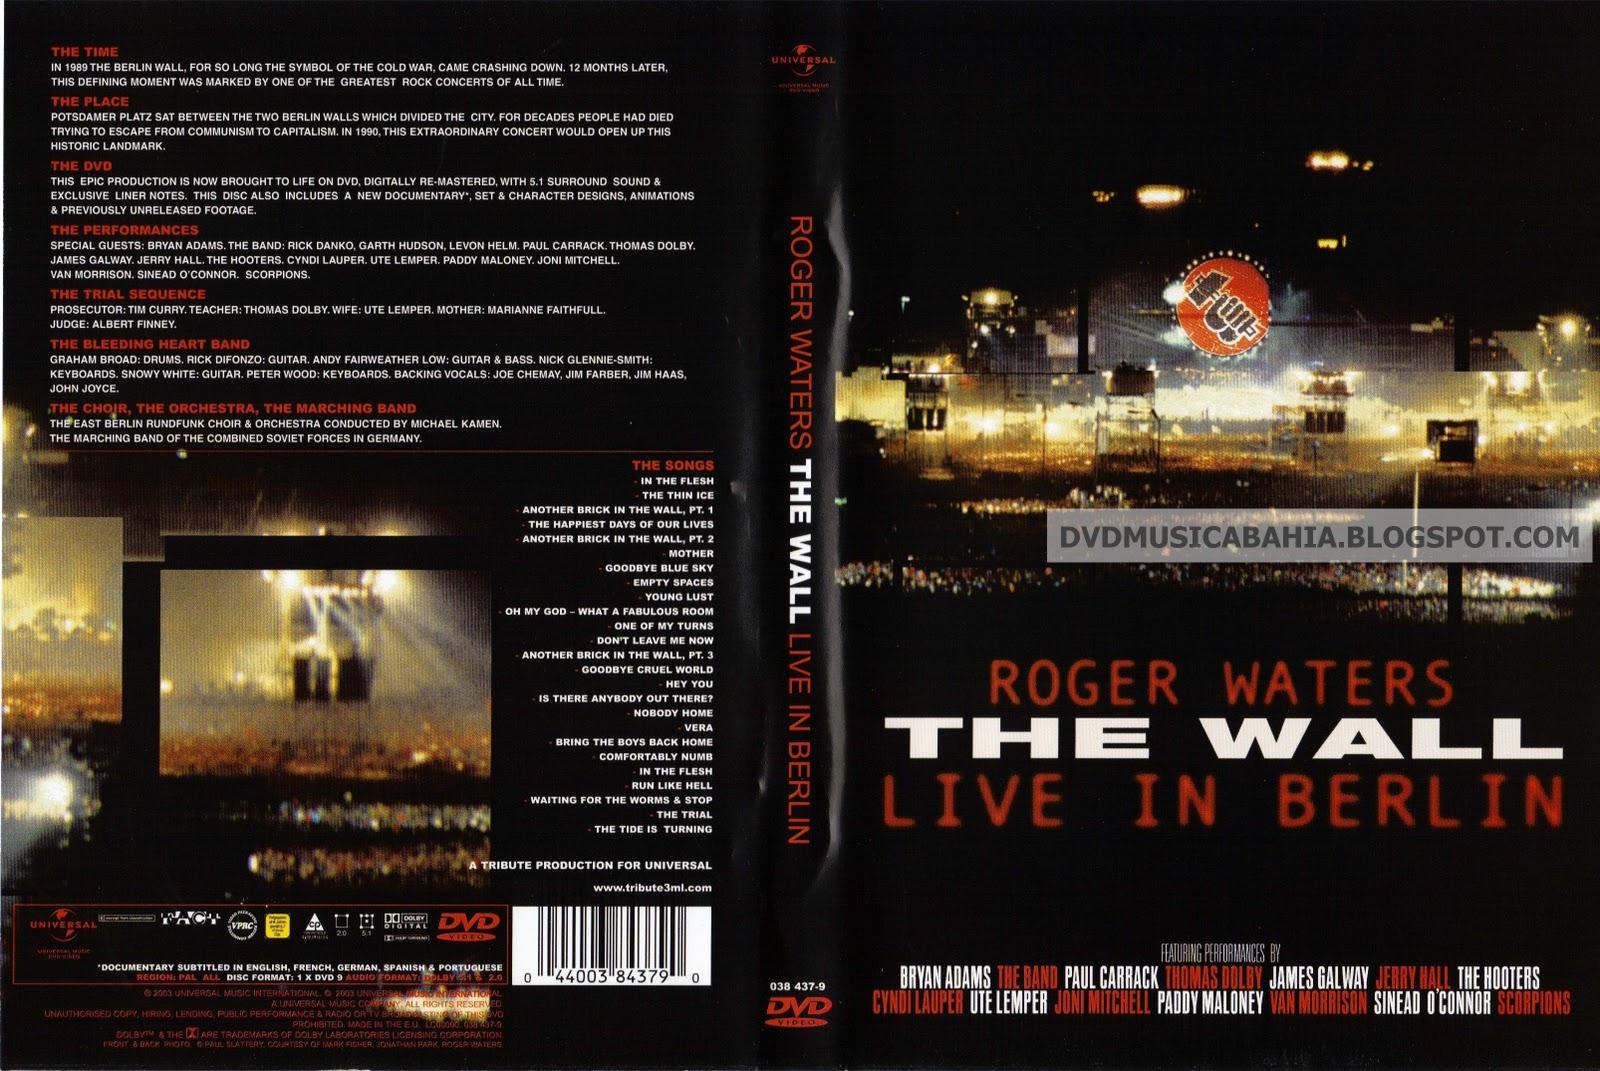 http://2.bp.blogspot.com/_PiUVny6RPwY/TPBEGW6fFTI/AAAAAAAABUA/UylVxqLNKS4/s1600/Pink_Floyd_The_Wall_Live_In_Berlin-%5Bcdcovers_cc%5D-front.jpg